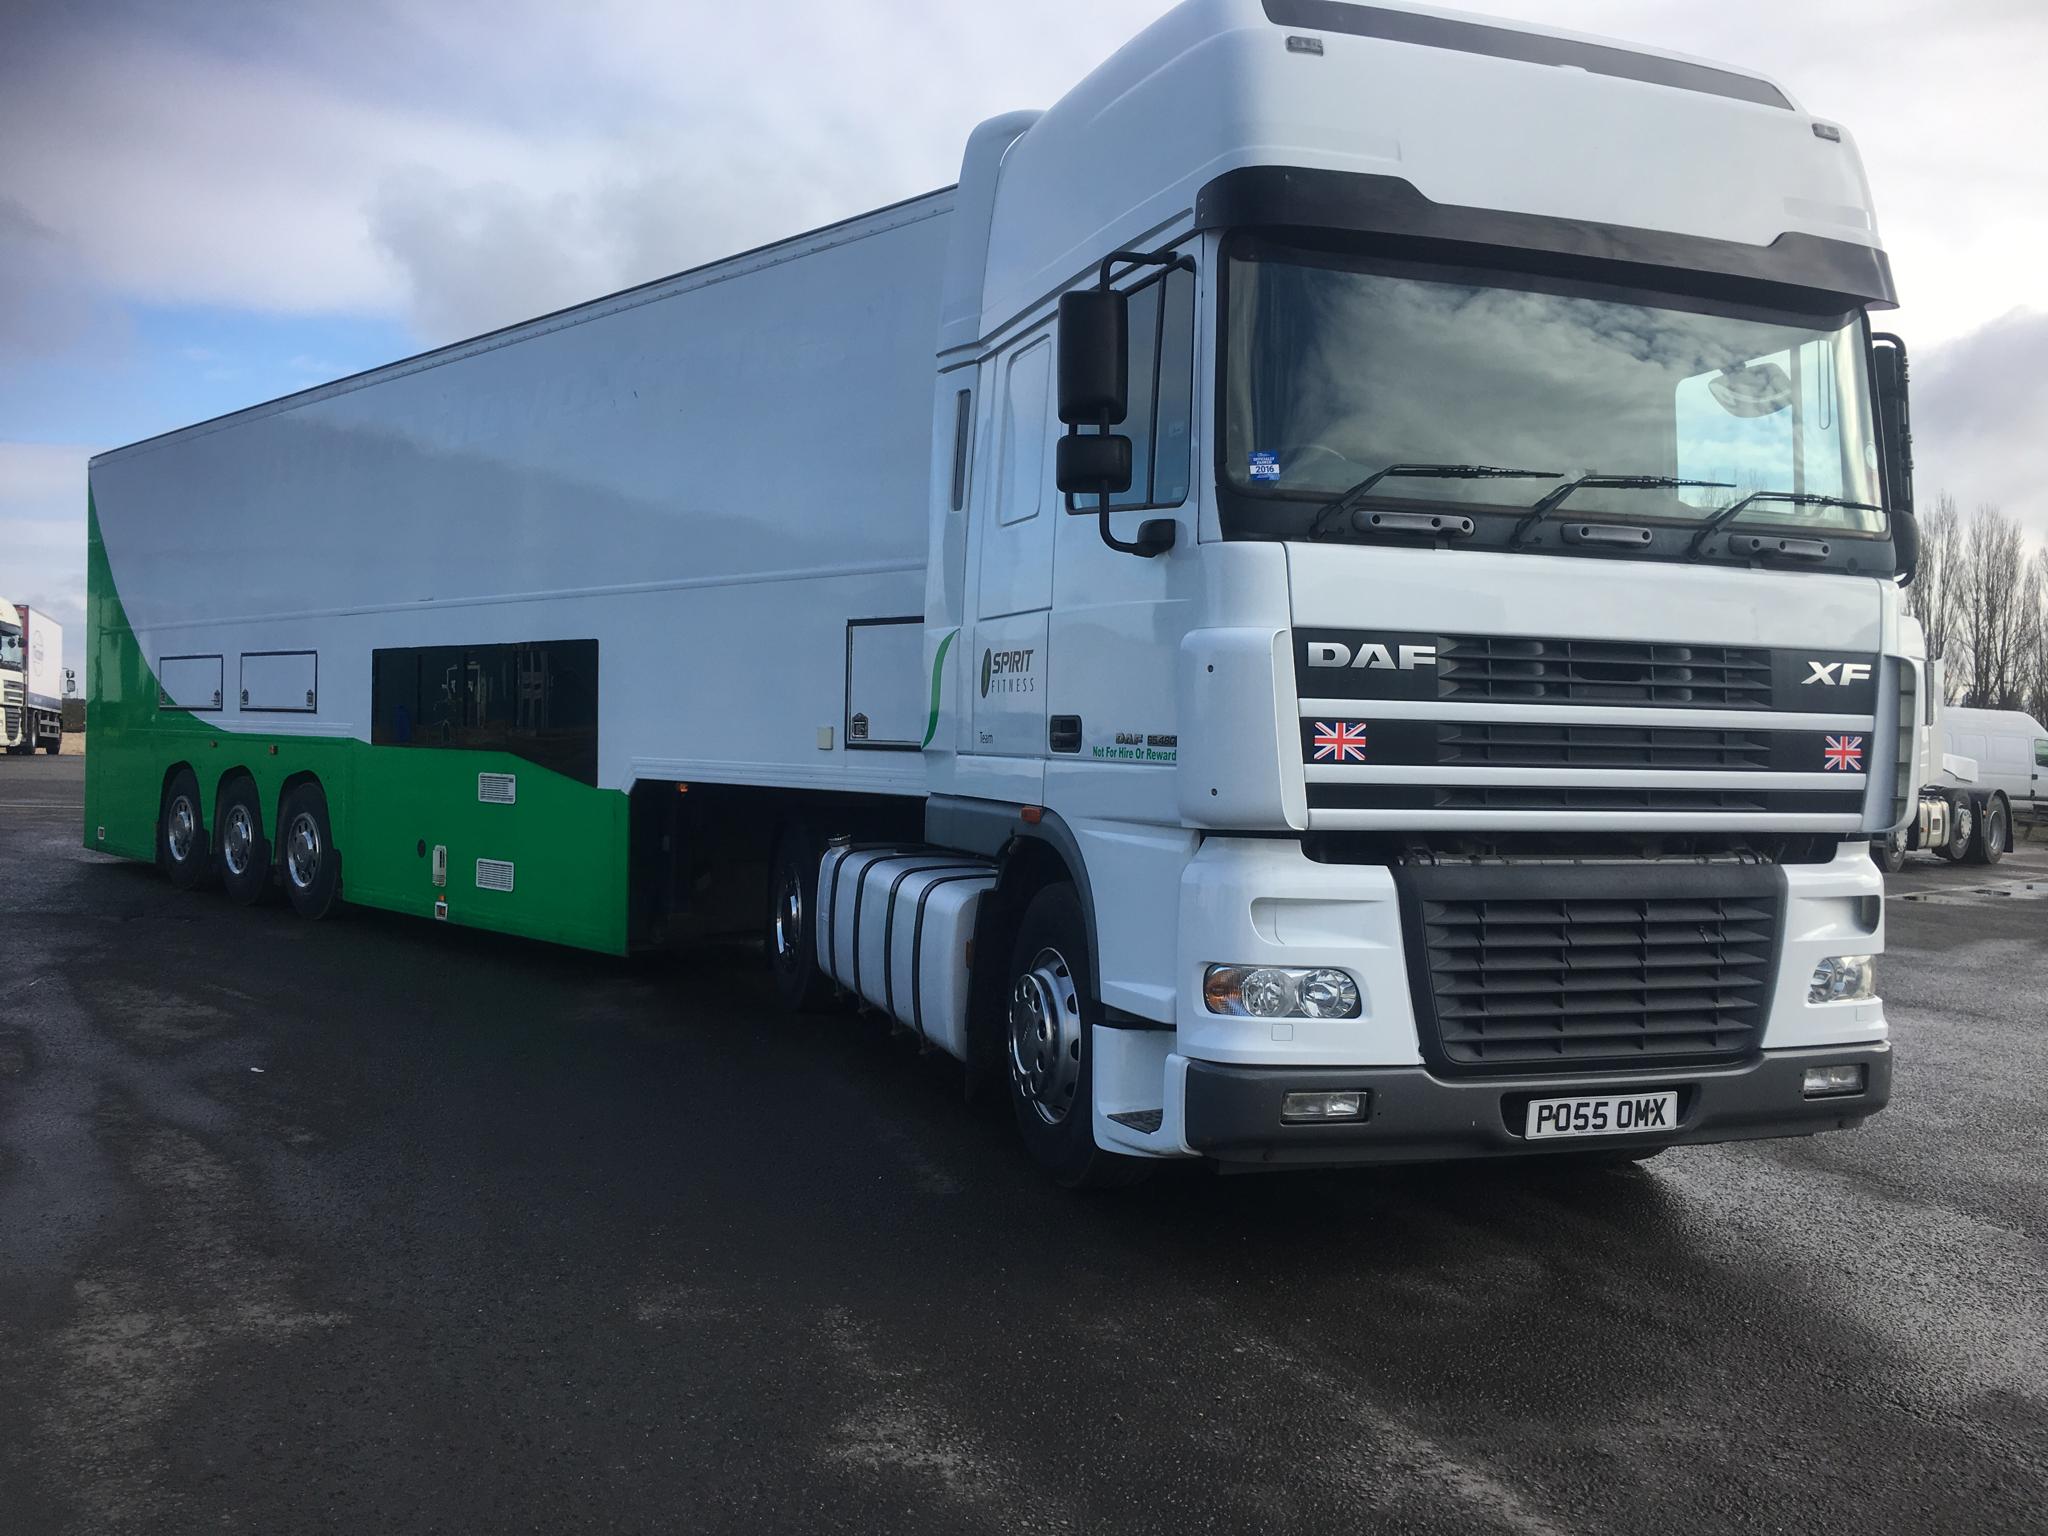 Truck on way to Portimao